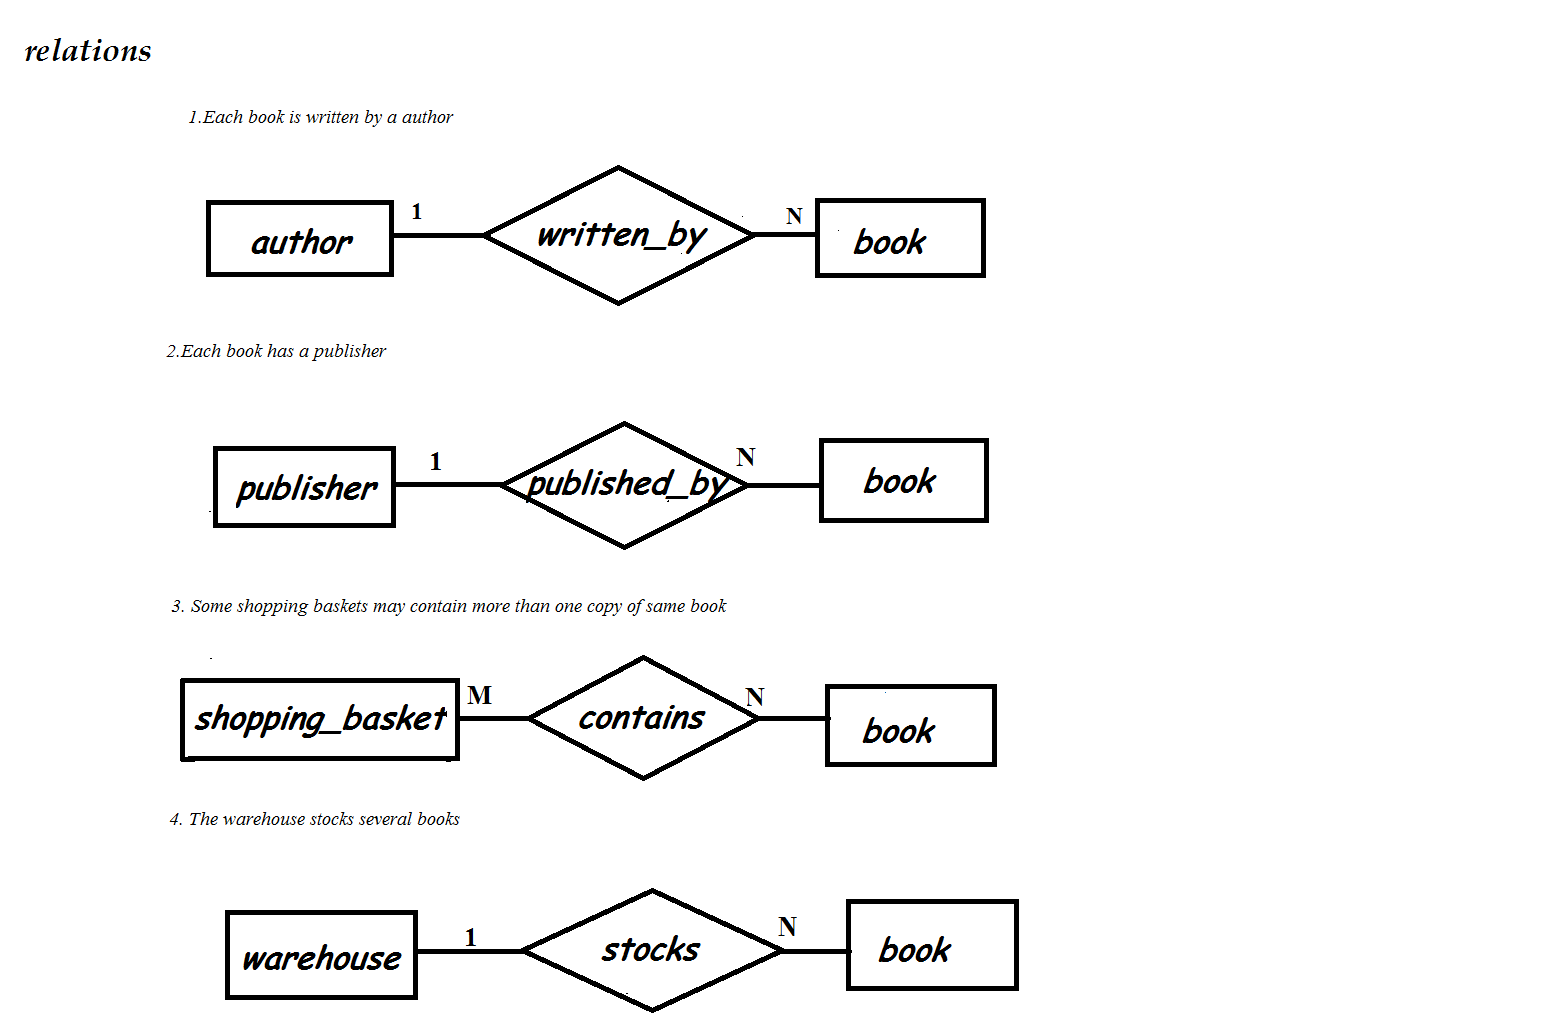 hight resolution of e r diagram for online bookstore roll n0 3 s5 cs2 lbs kuttipedia rh lbsitbytes2010 wordpress com